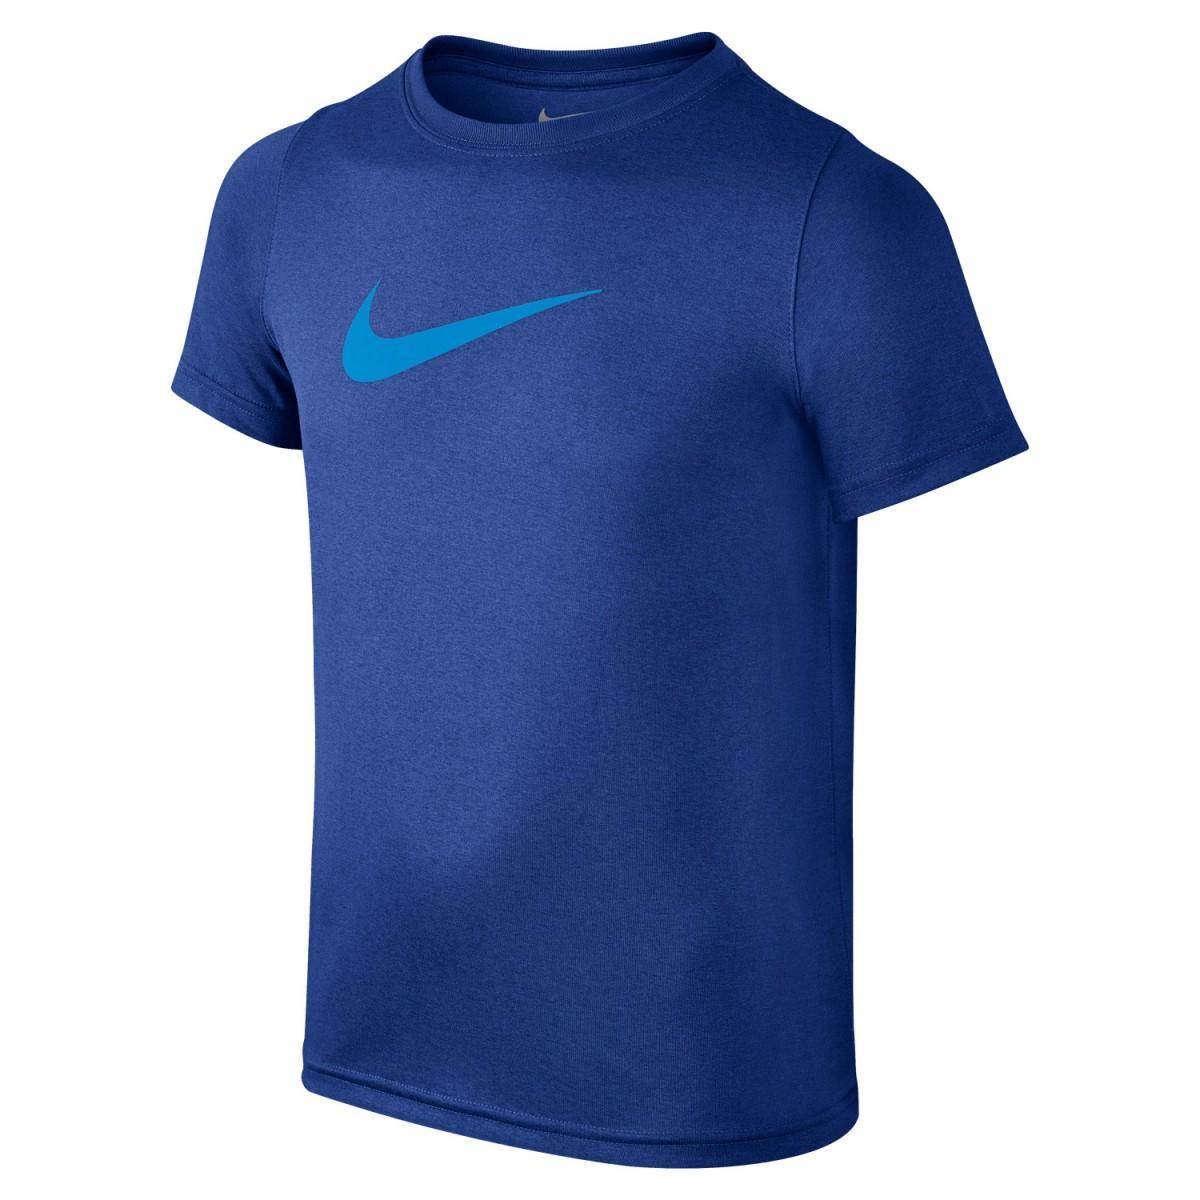 Теннисная футболка детская Nike Dry Tee SS Swoosh Solid dark blue